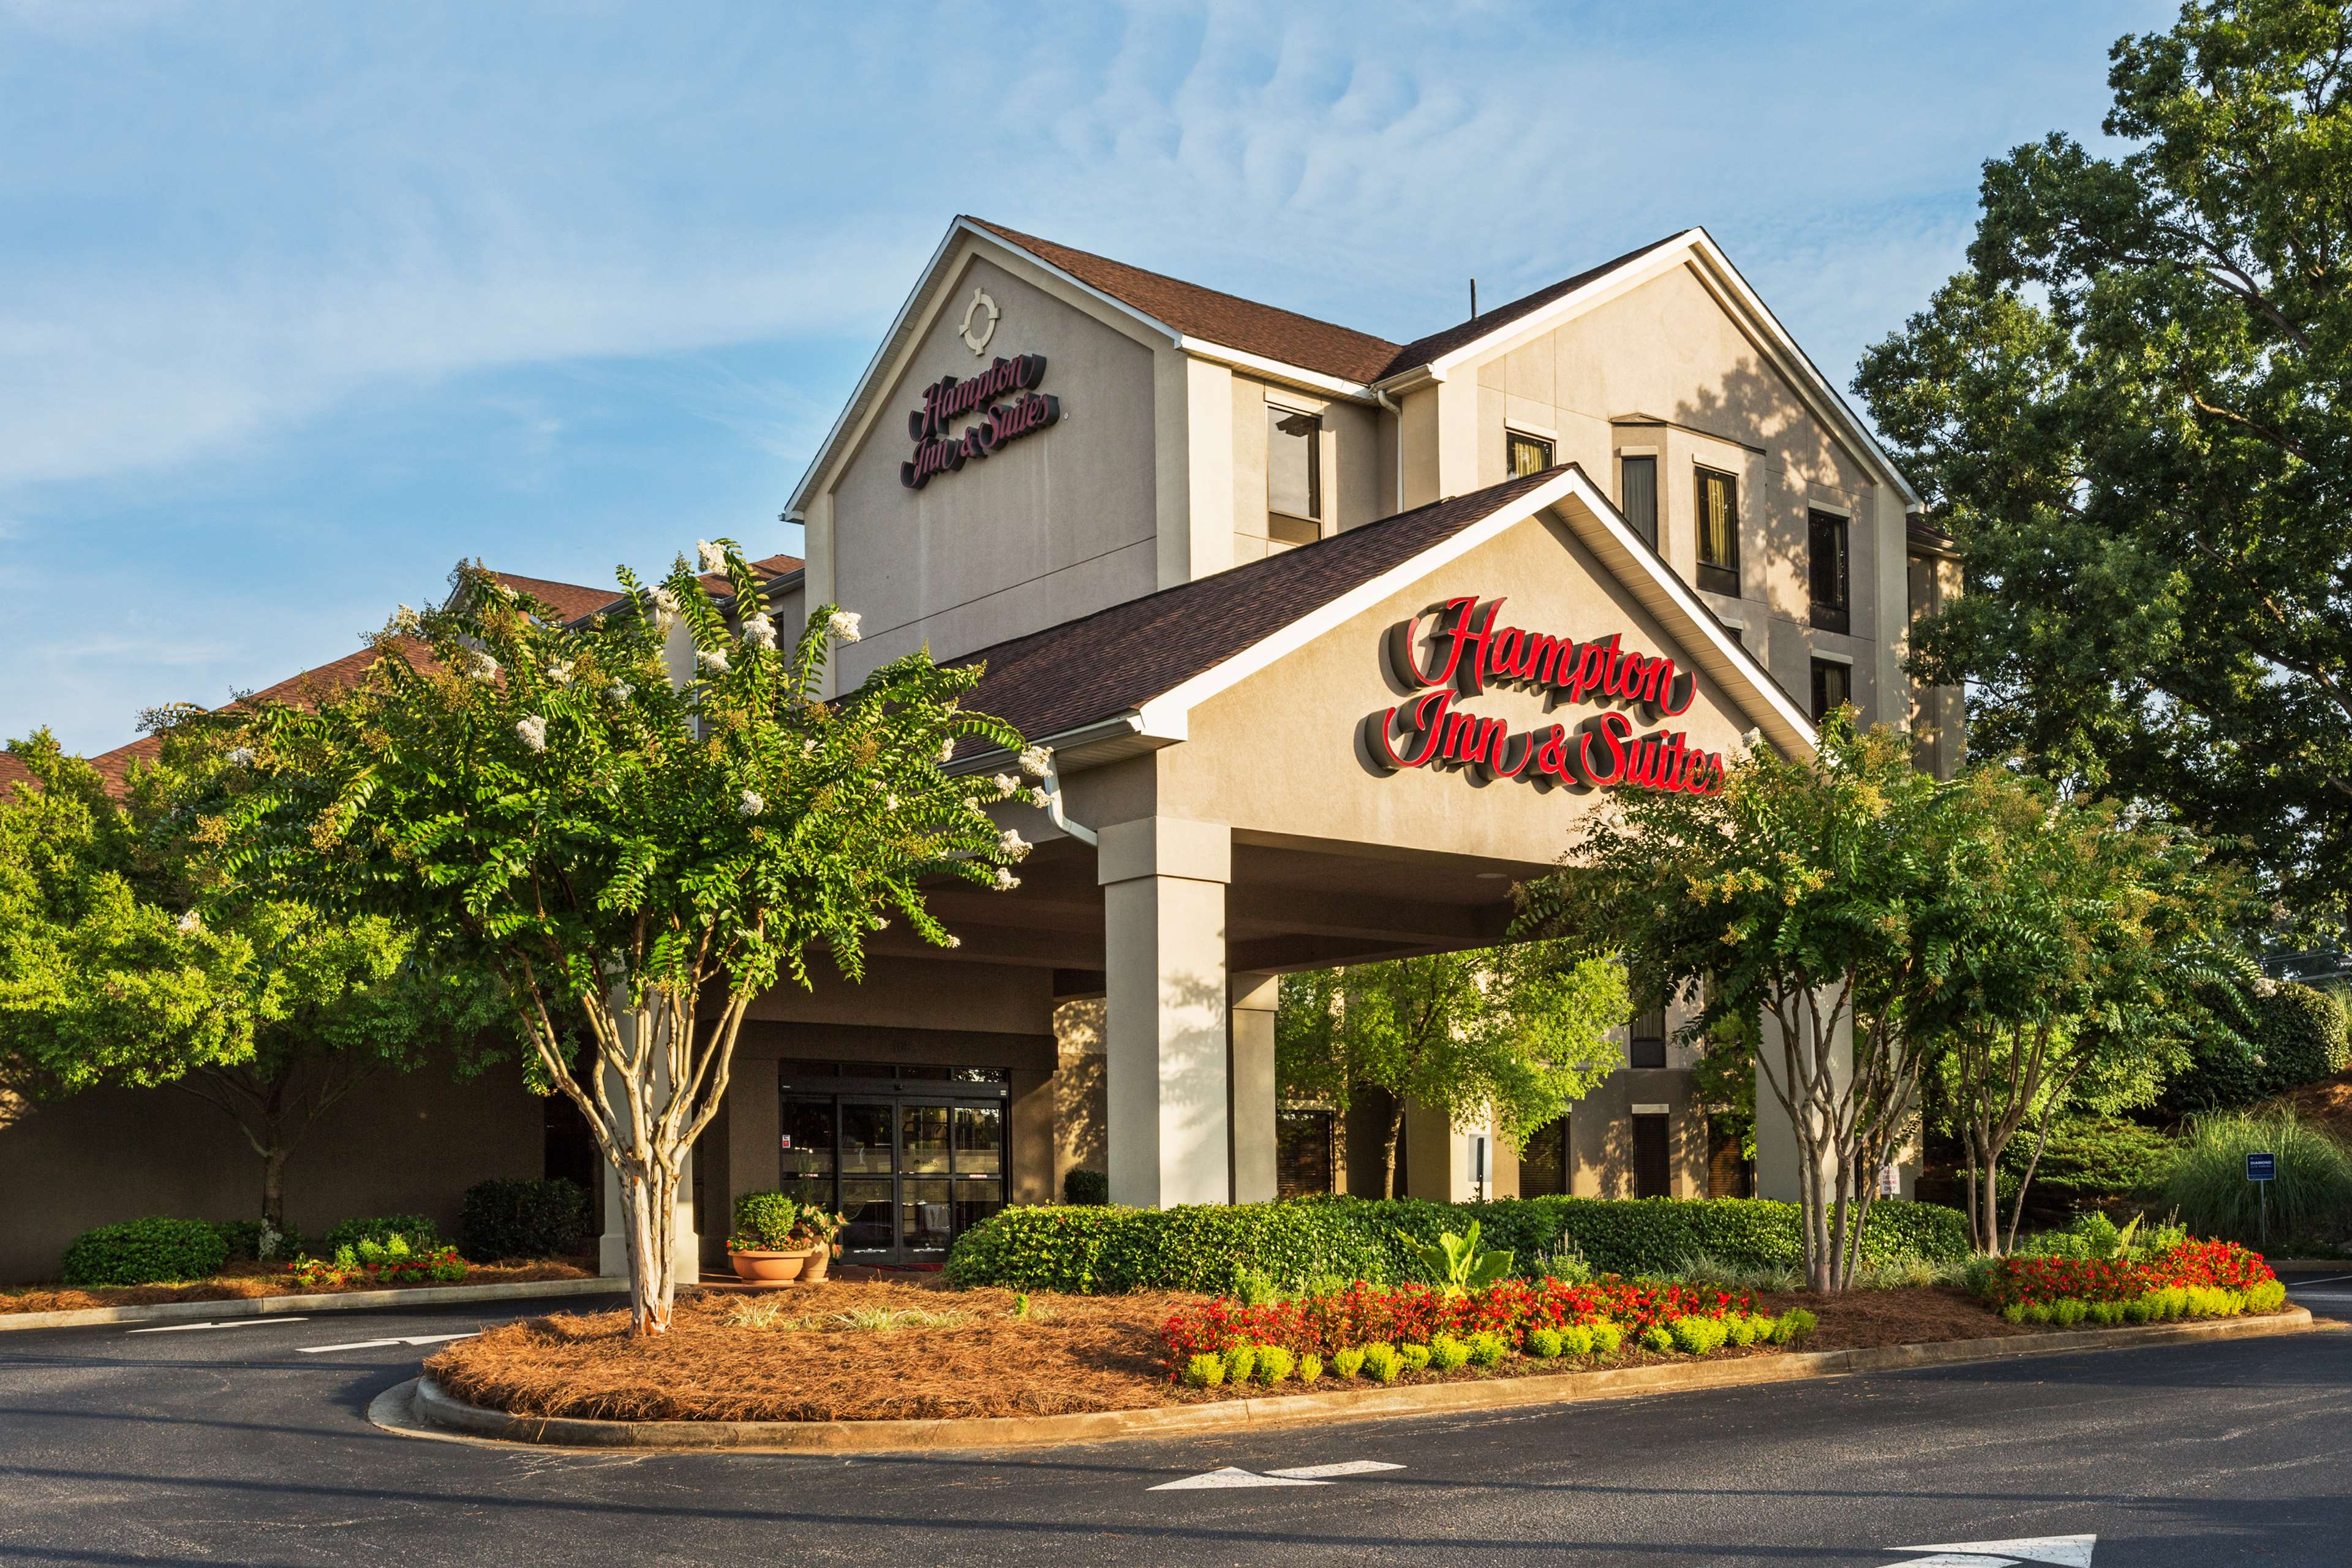 Hampton Inn & Suites Greenville/Spartanburg I-85 image 3